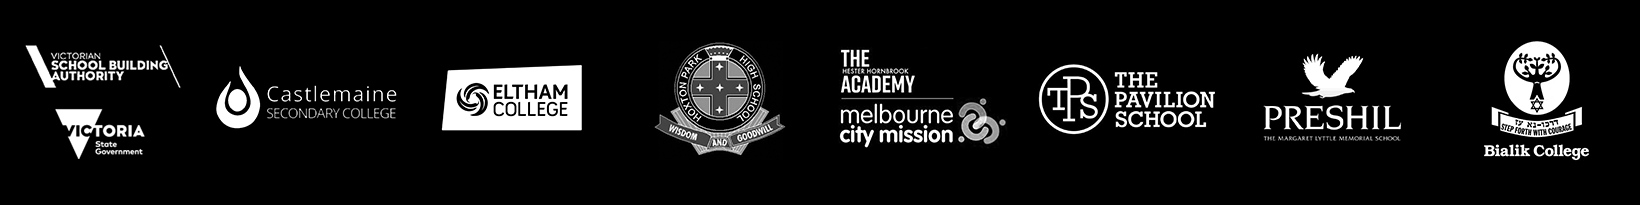 Logos: Victorian School Building Authority | Castlemaine Secondary College | Etltham College | Hoxton Park High | The Hester Hornsbrook Academy | The Pavilion School | Preshil School | Bialik College